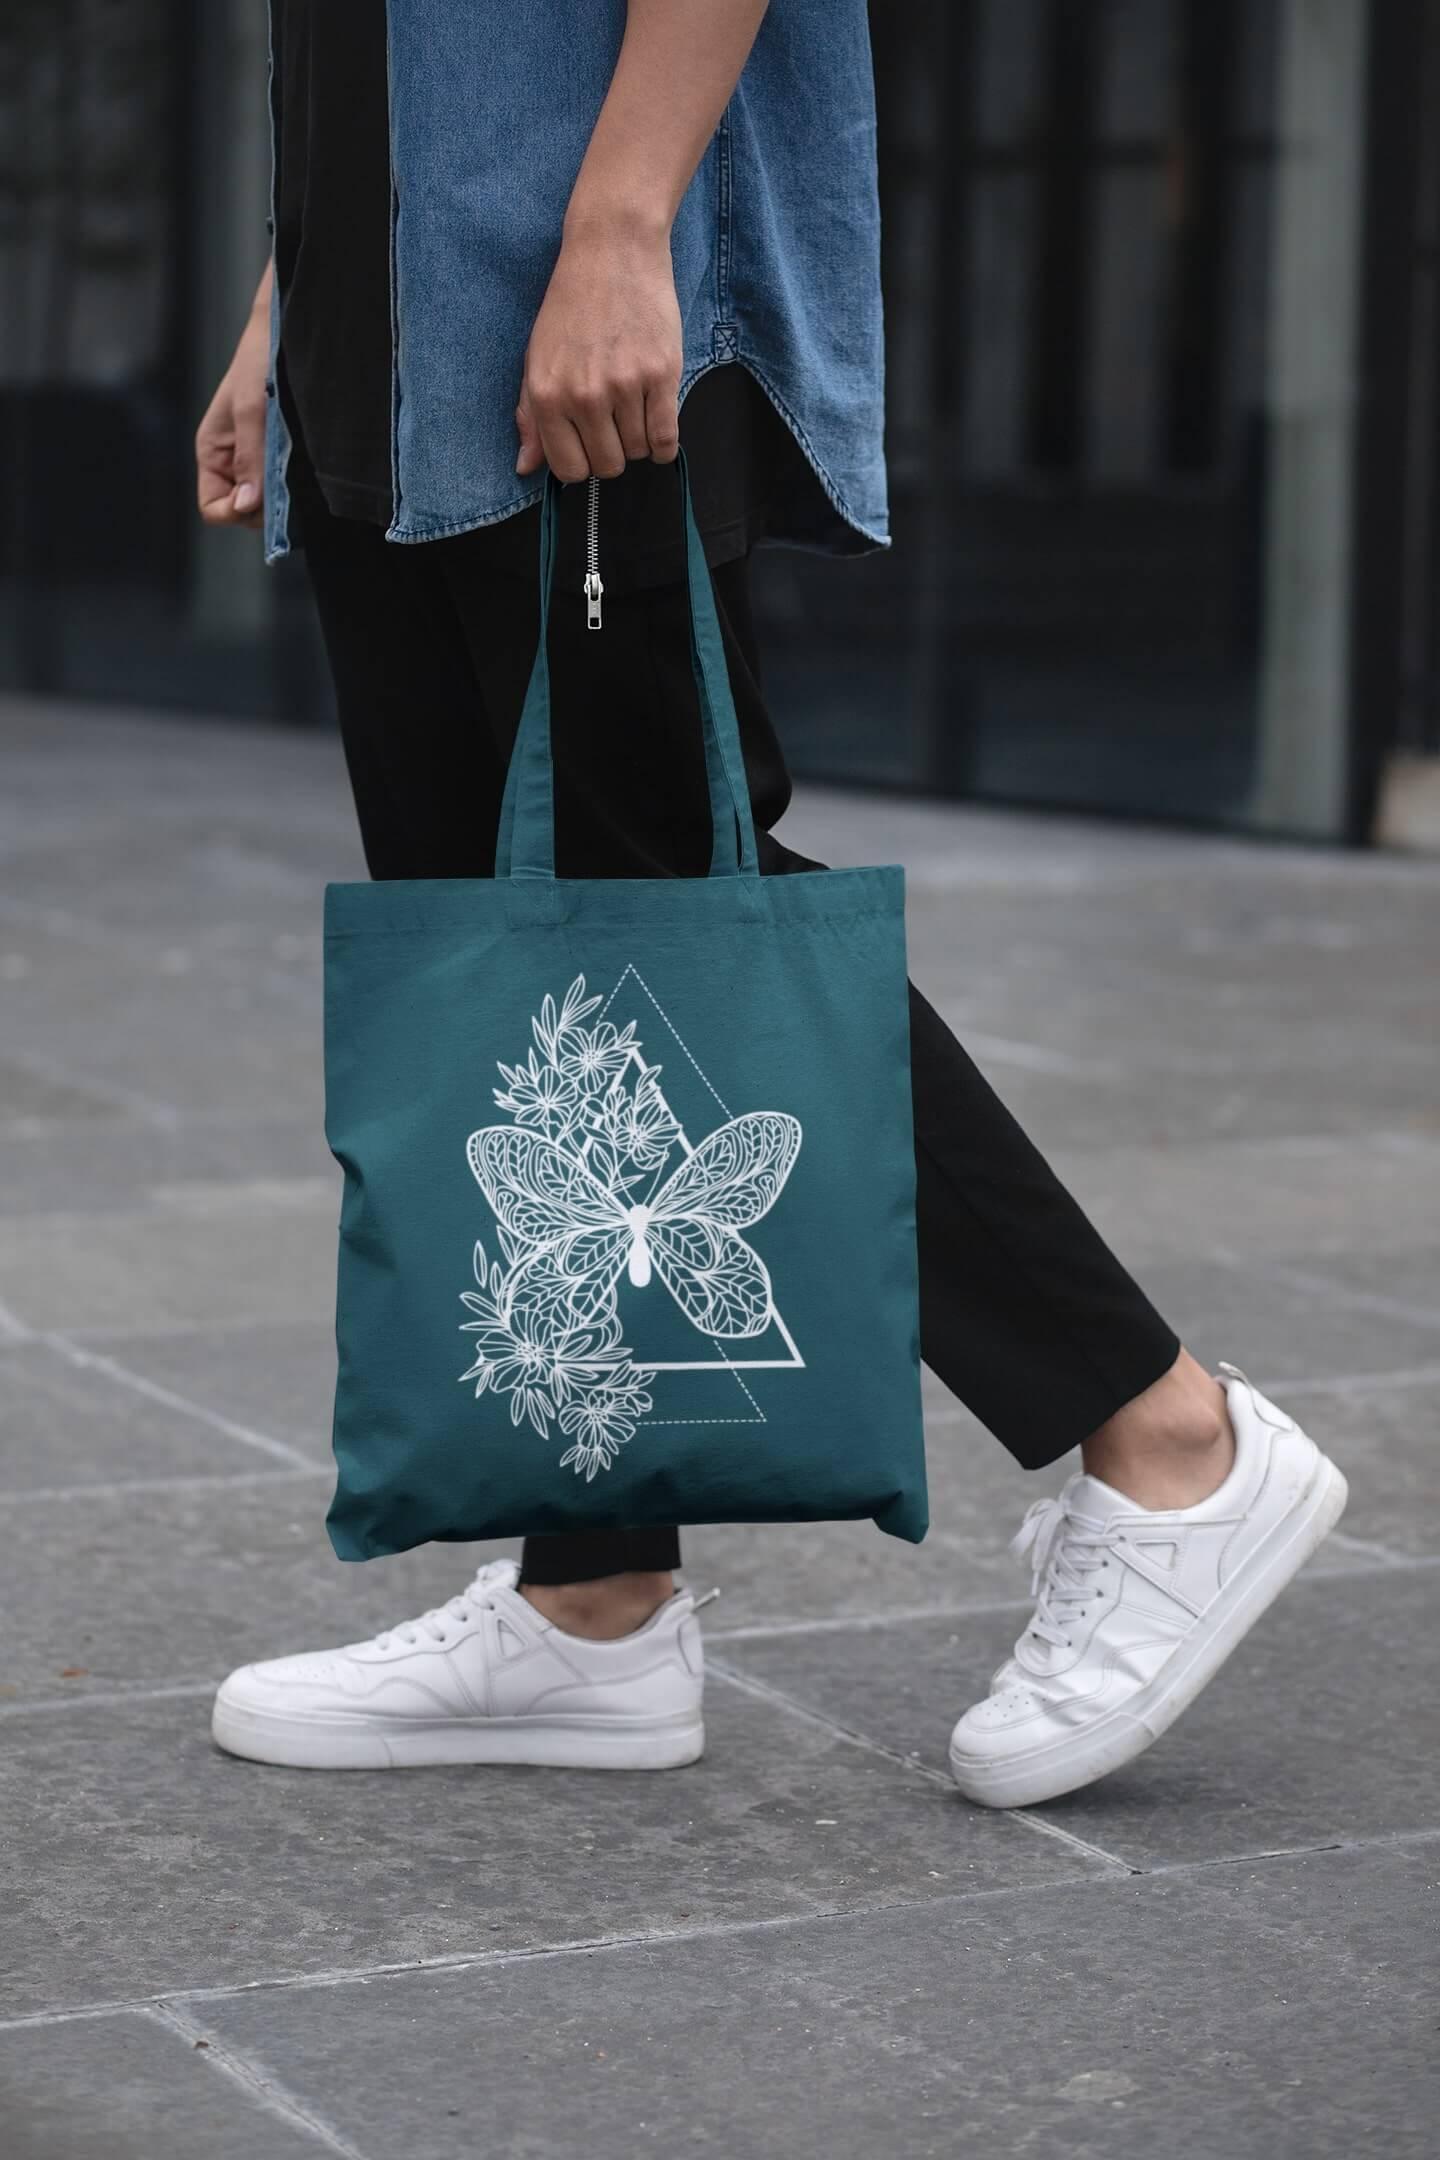 MMO Bavlnená taška Motýľ Farba tašky: Petrolejová